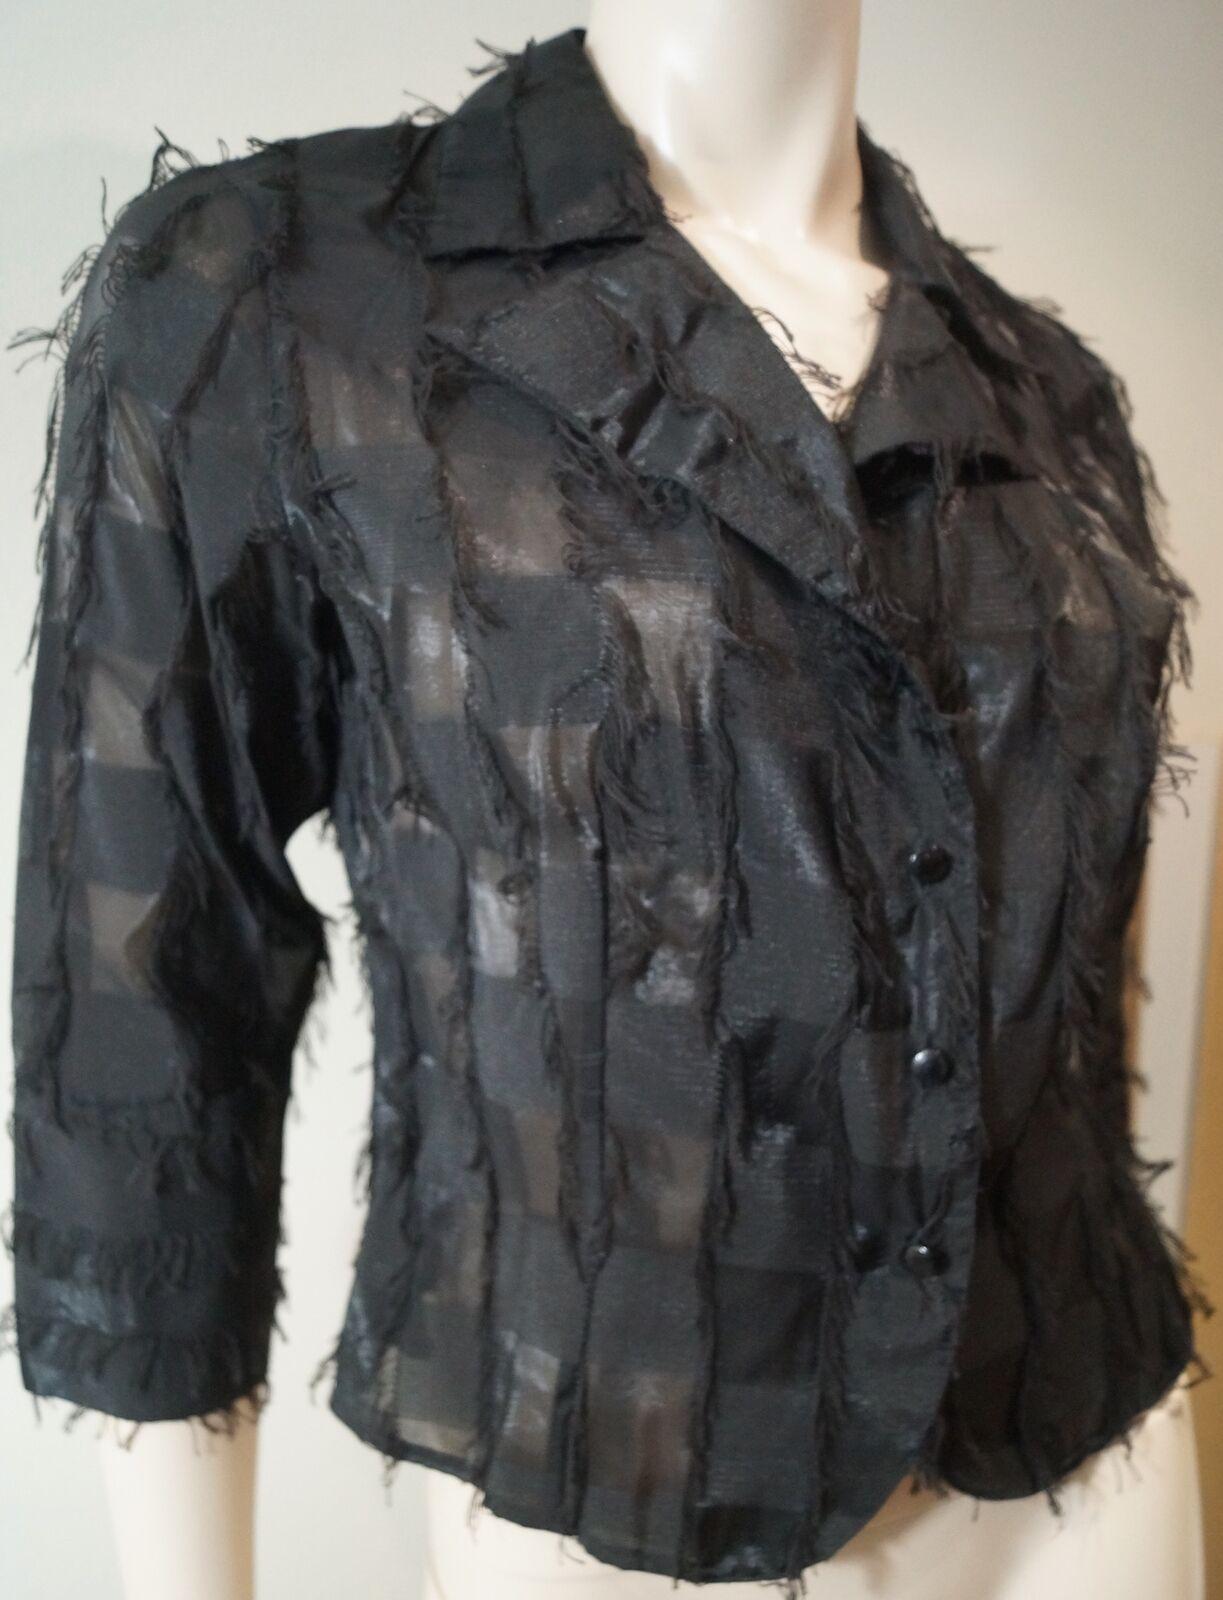 ANNE FONTAINE schwarz Cotton Blend V Neck 3 4 Sleeve Blouse Jacket Top Sz2 UK6